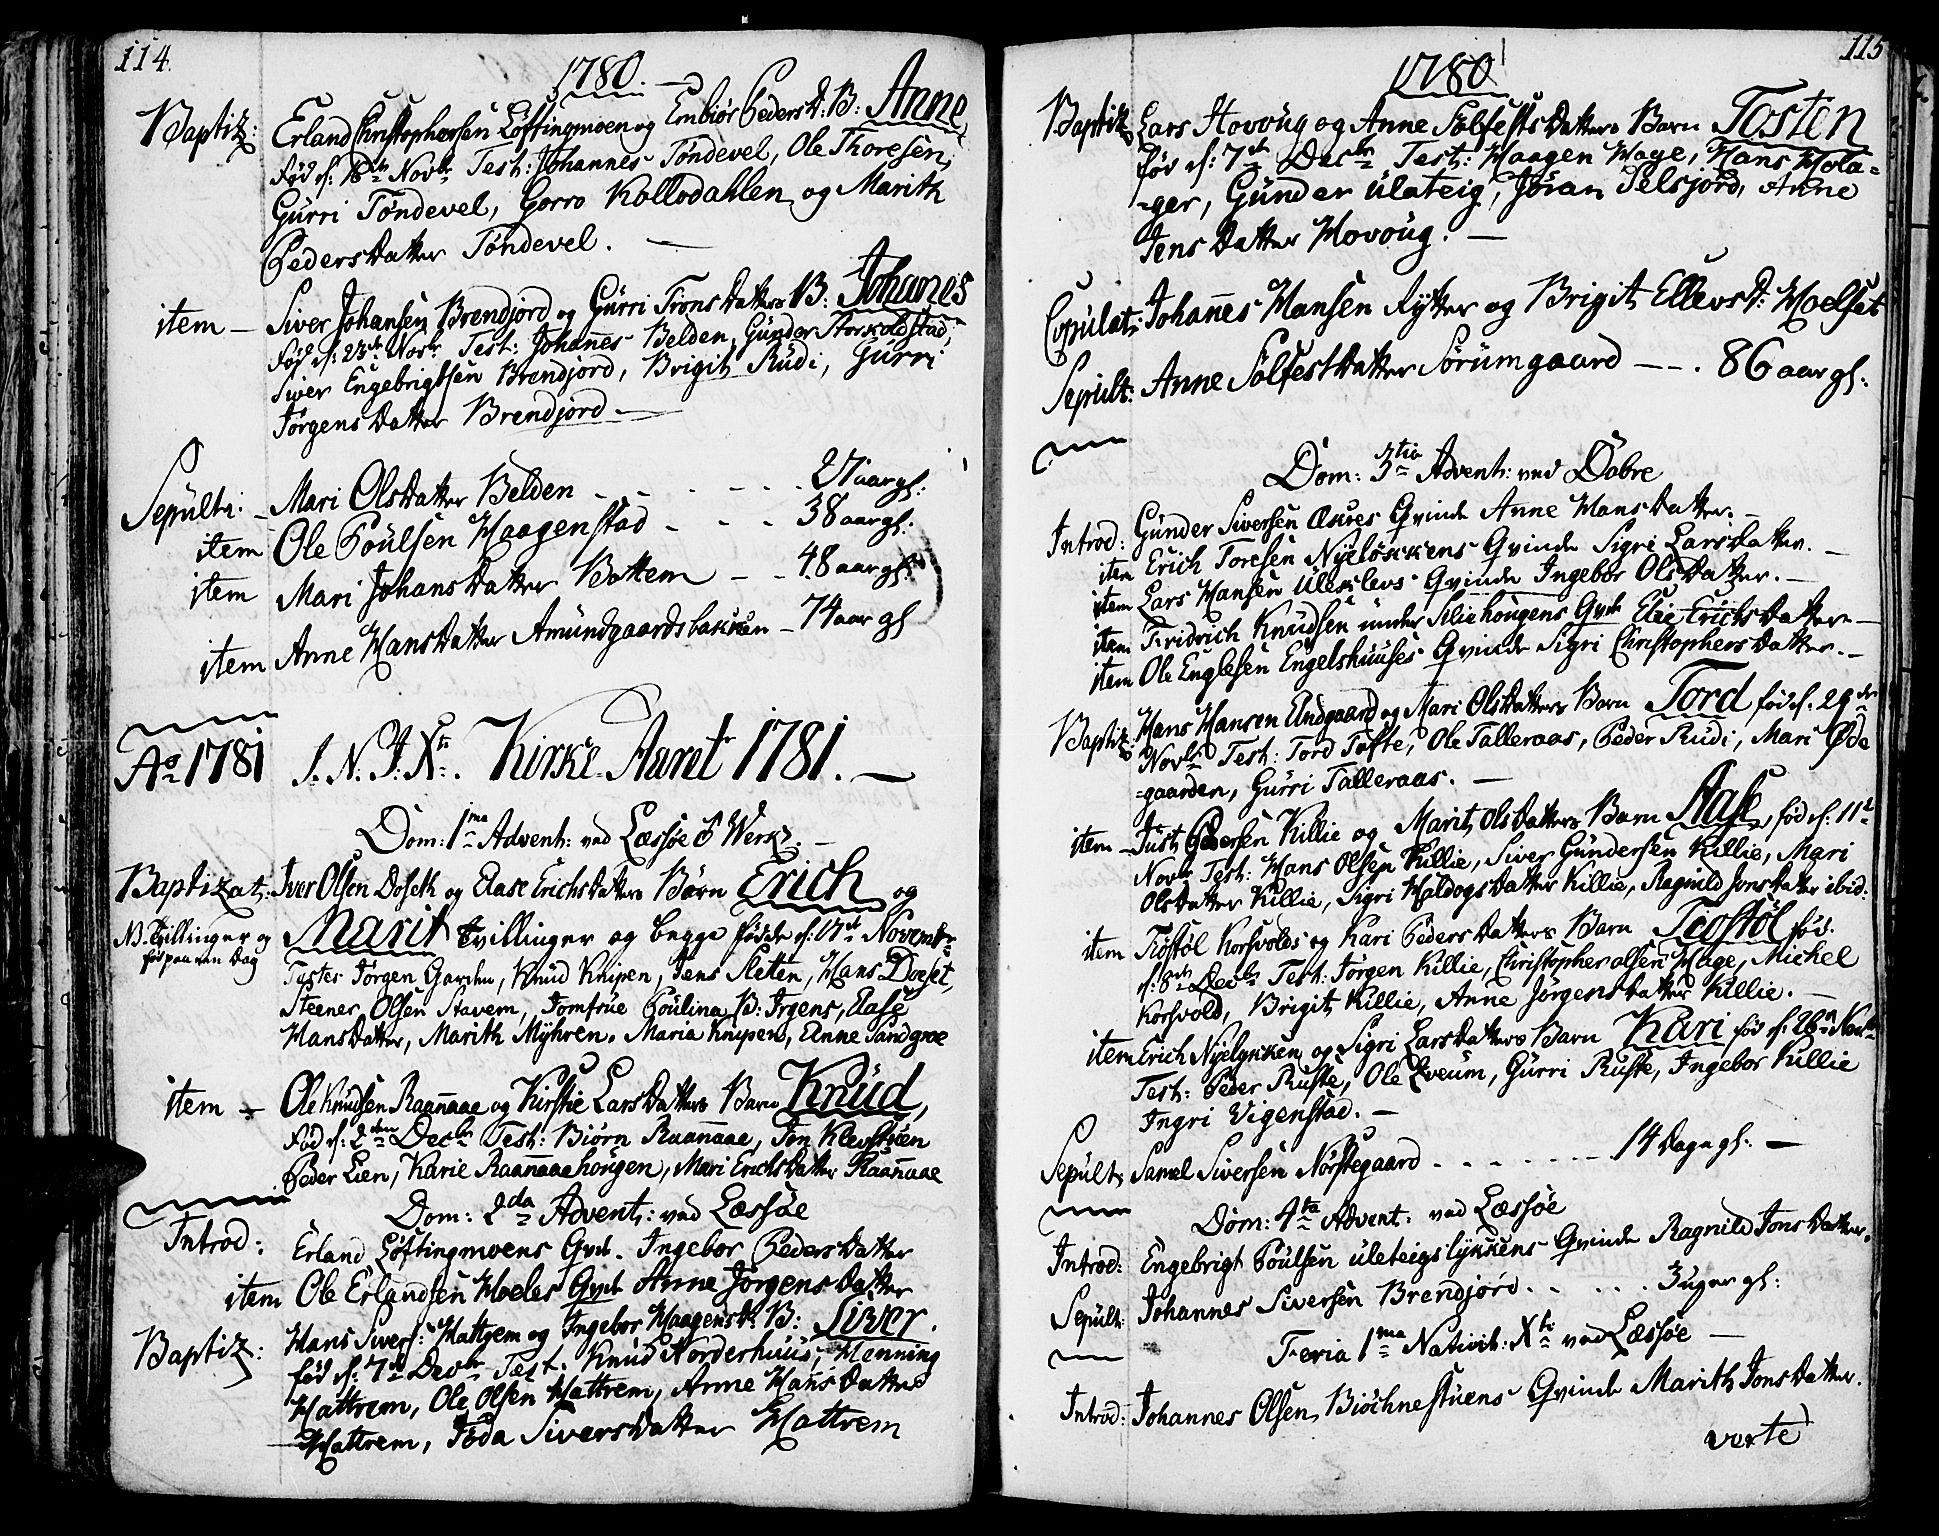 SAH, Lesja prestekontor, Ministerialbok nr. 3, 1777-1819, s. 114-115